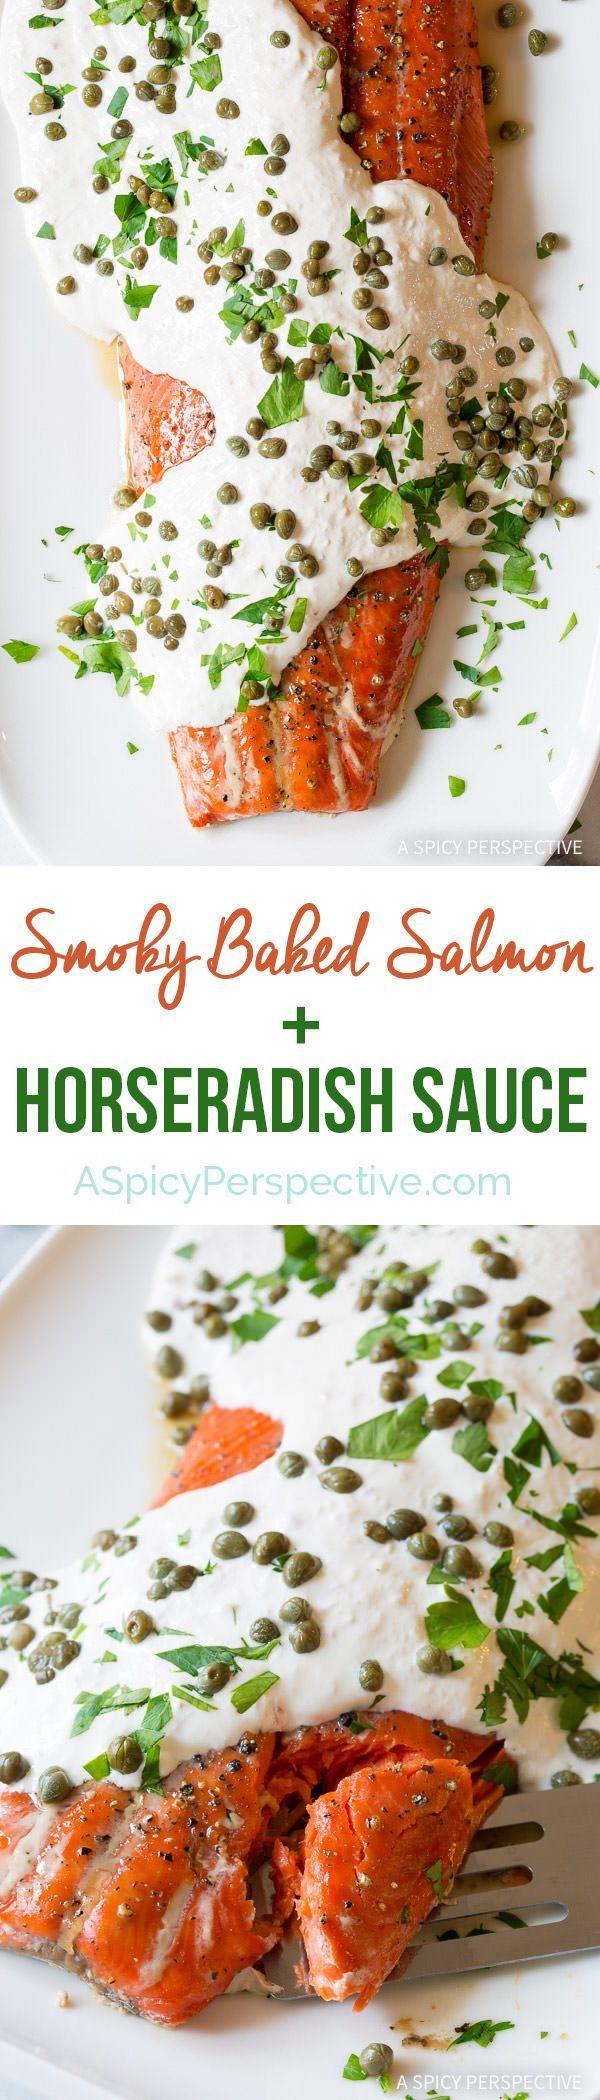 Amazing 10-Ingredient Smoky Baked Salmon Recipe with Creamy Horseradish Sauce